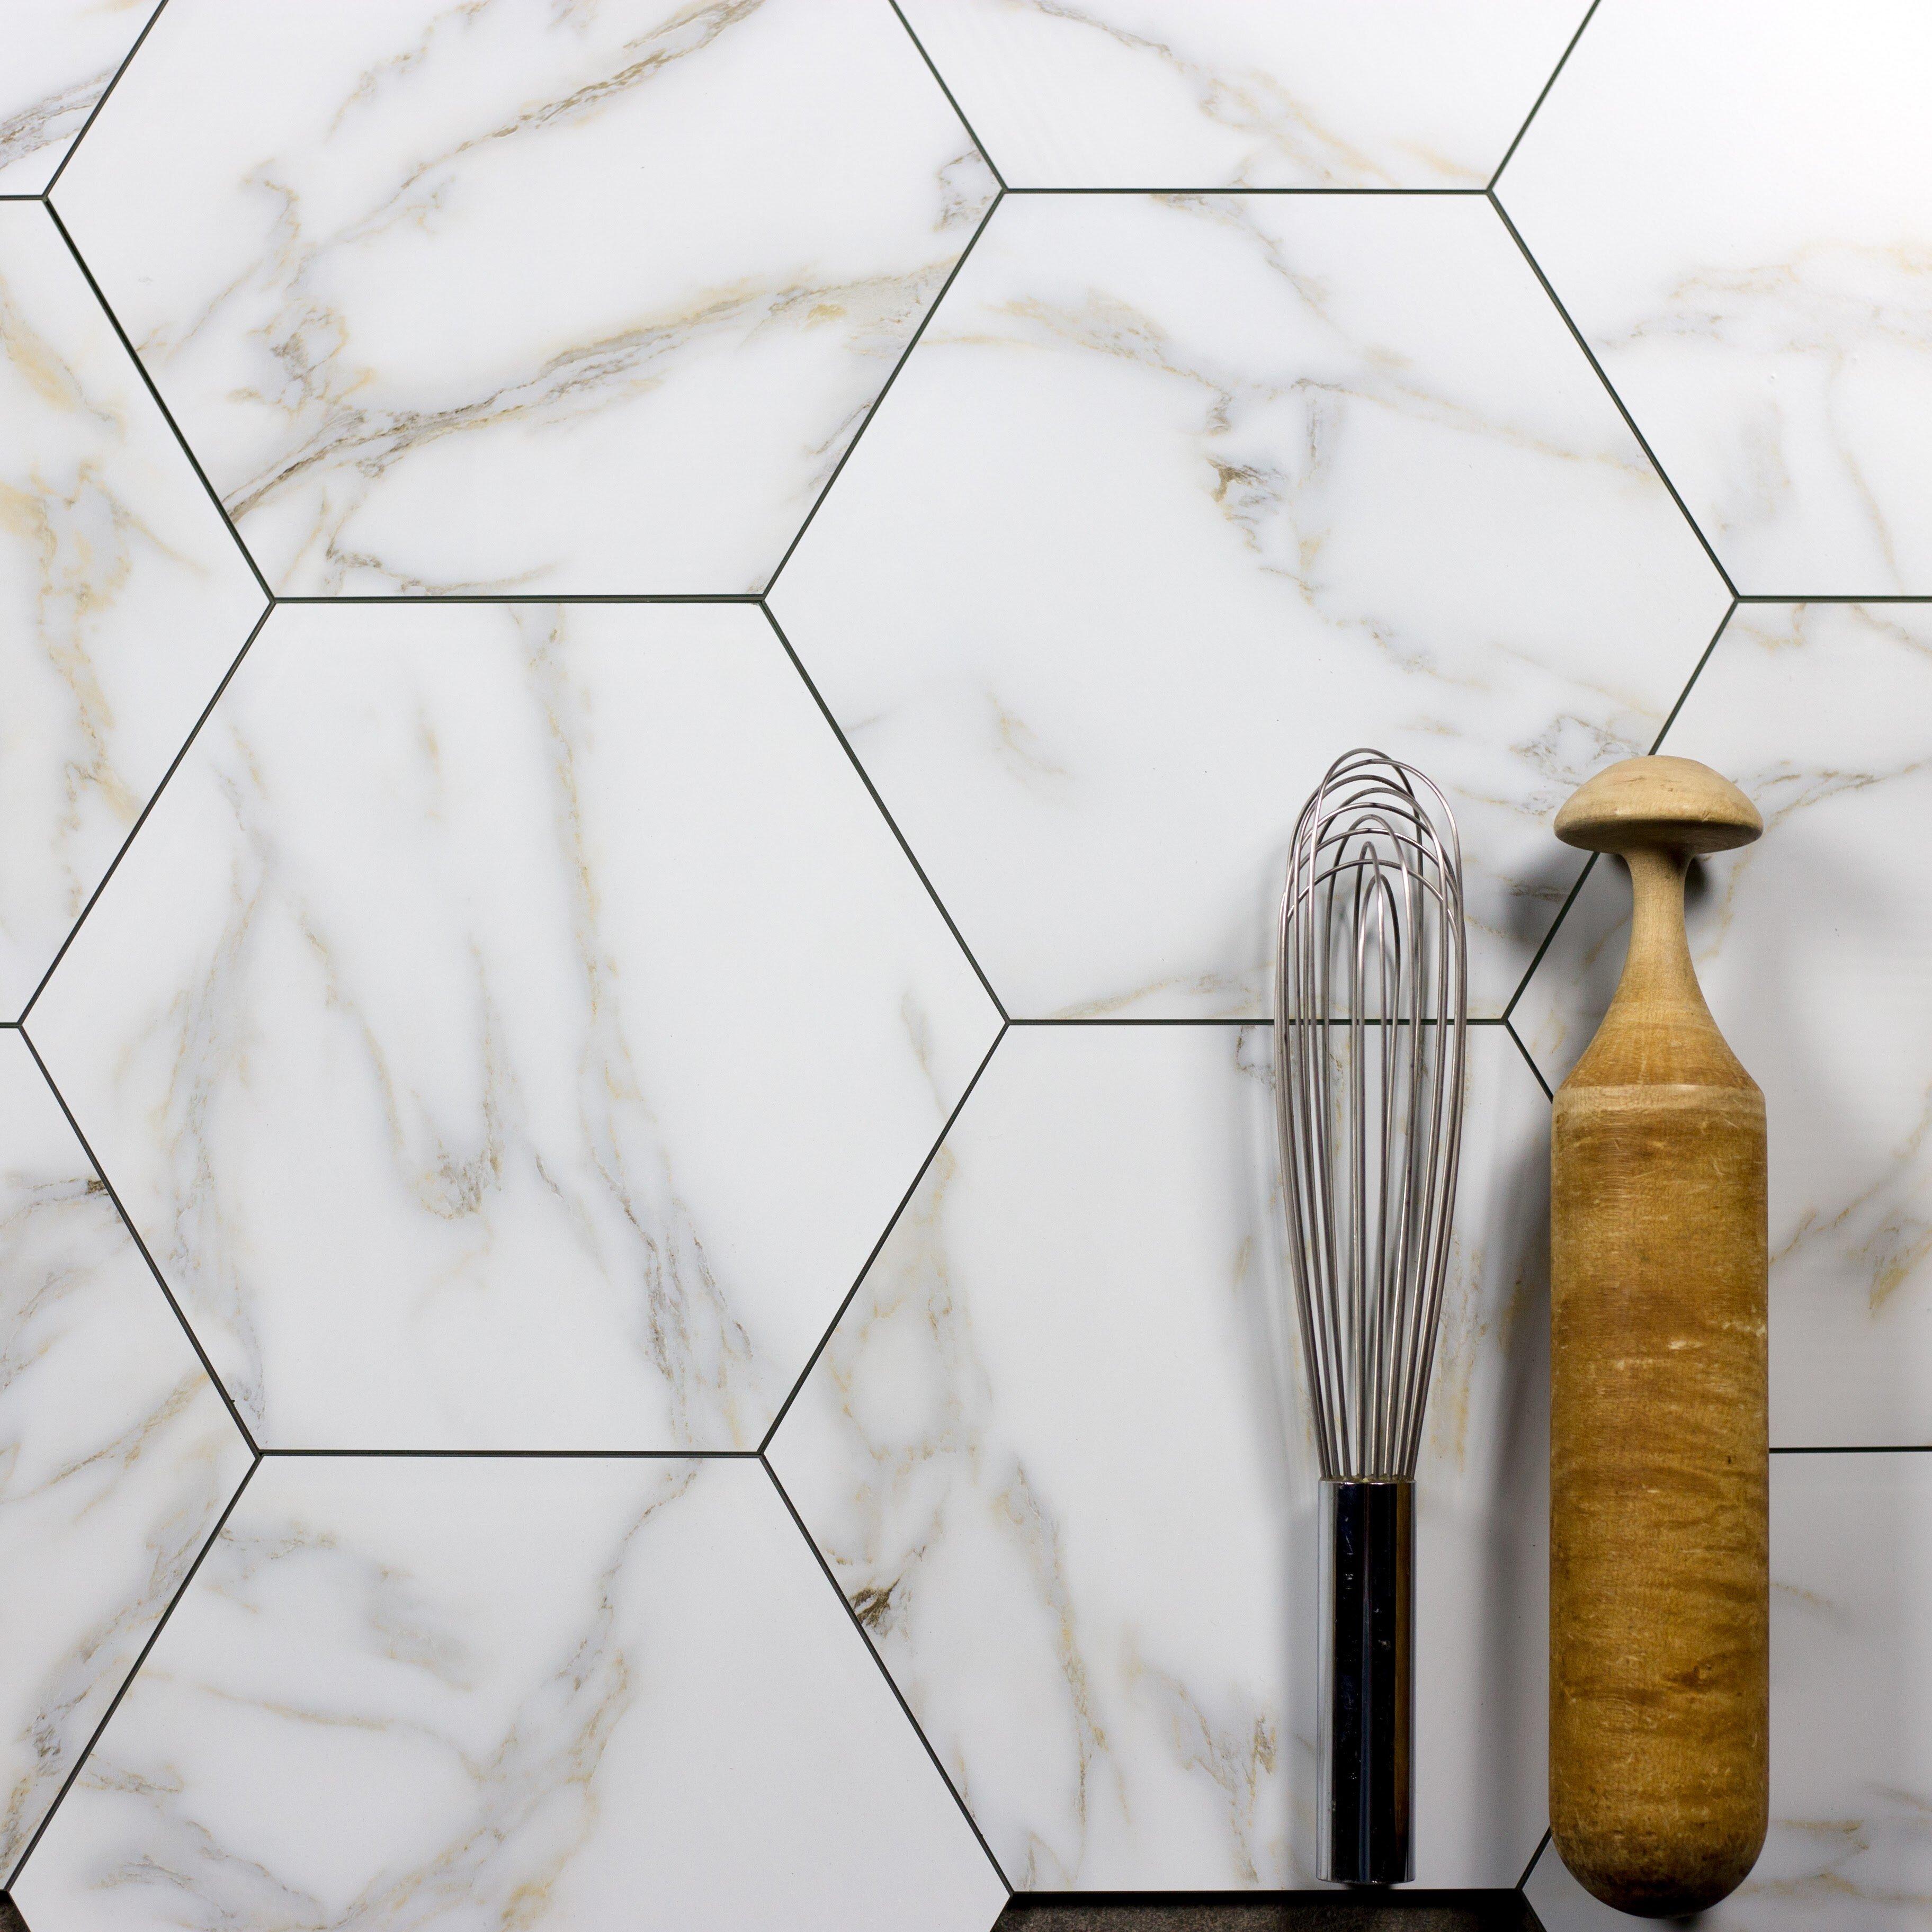 - Abolos Nature Calacatta Gold 8 X 8 Glass Mosaic Tile Wayfair